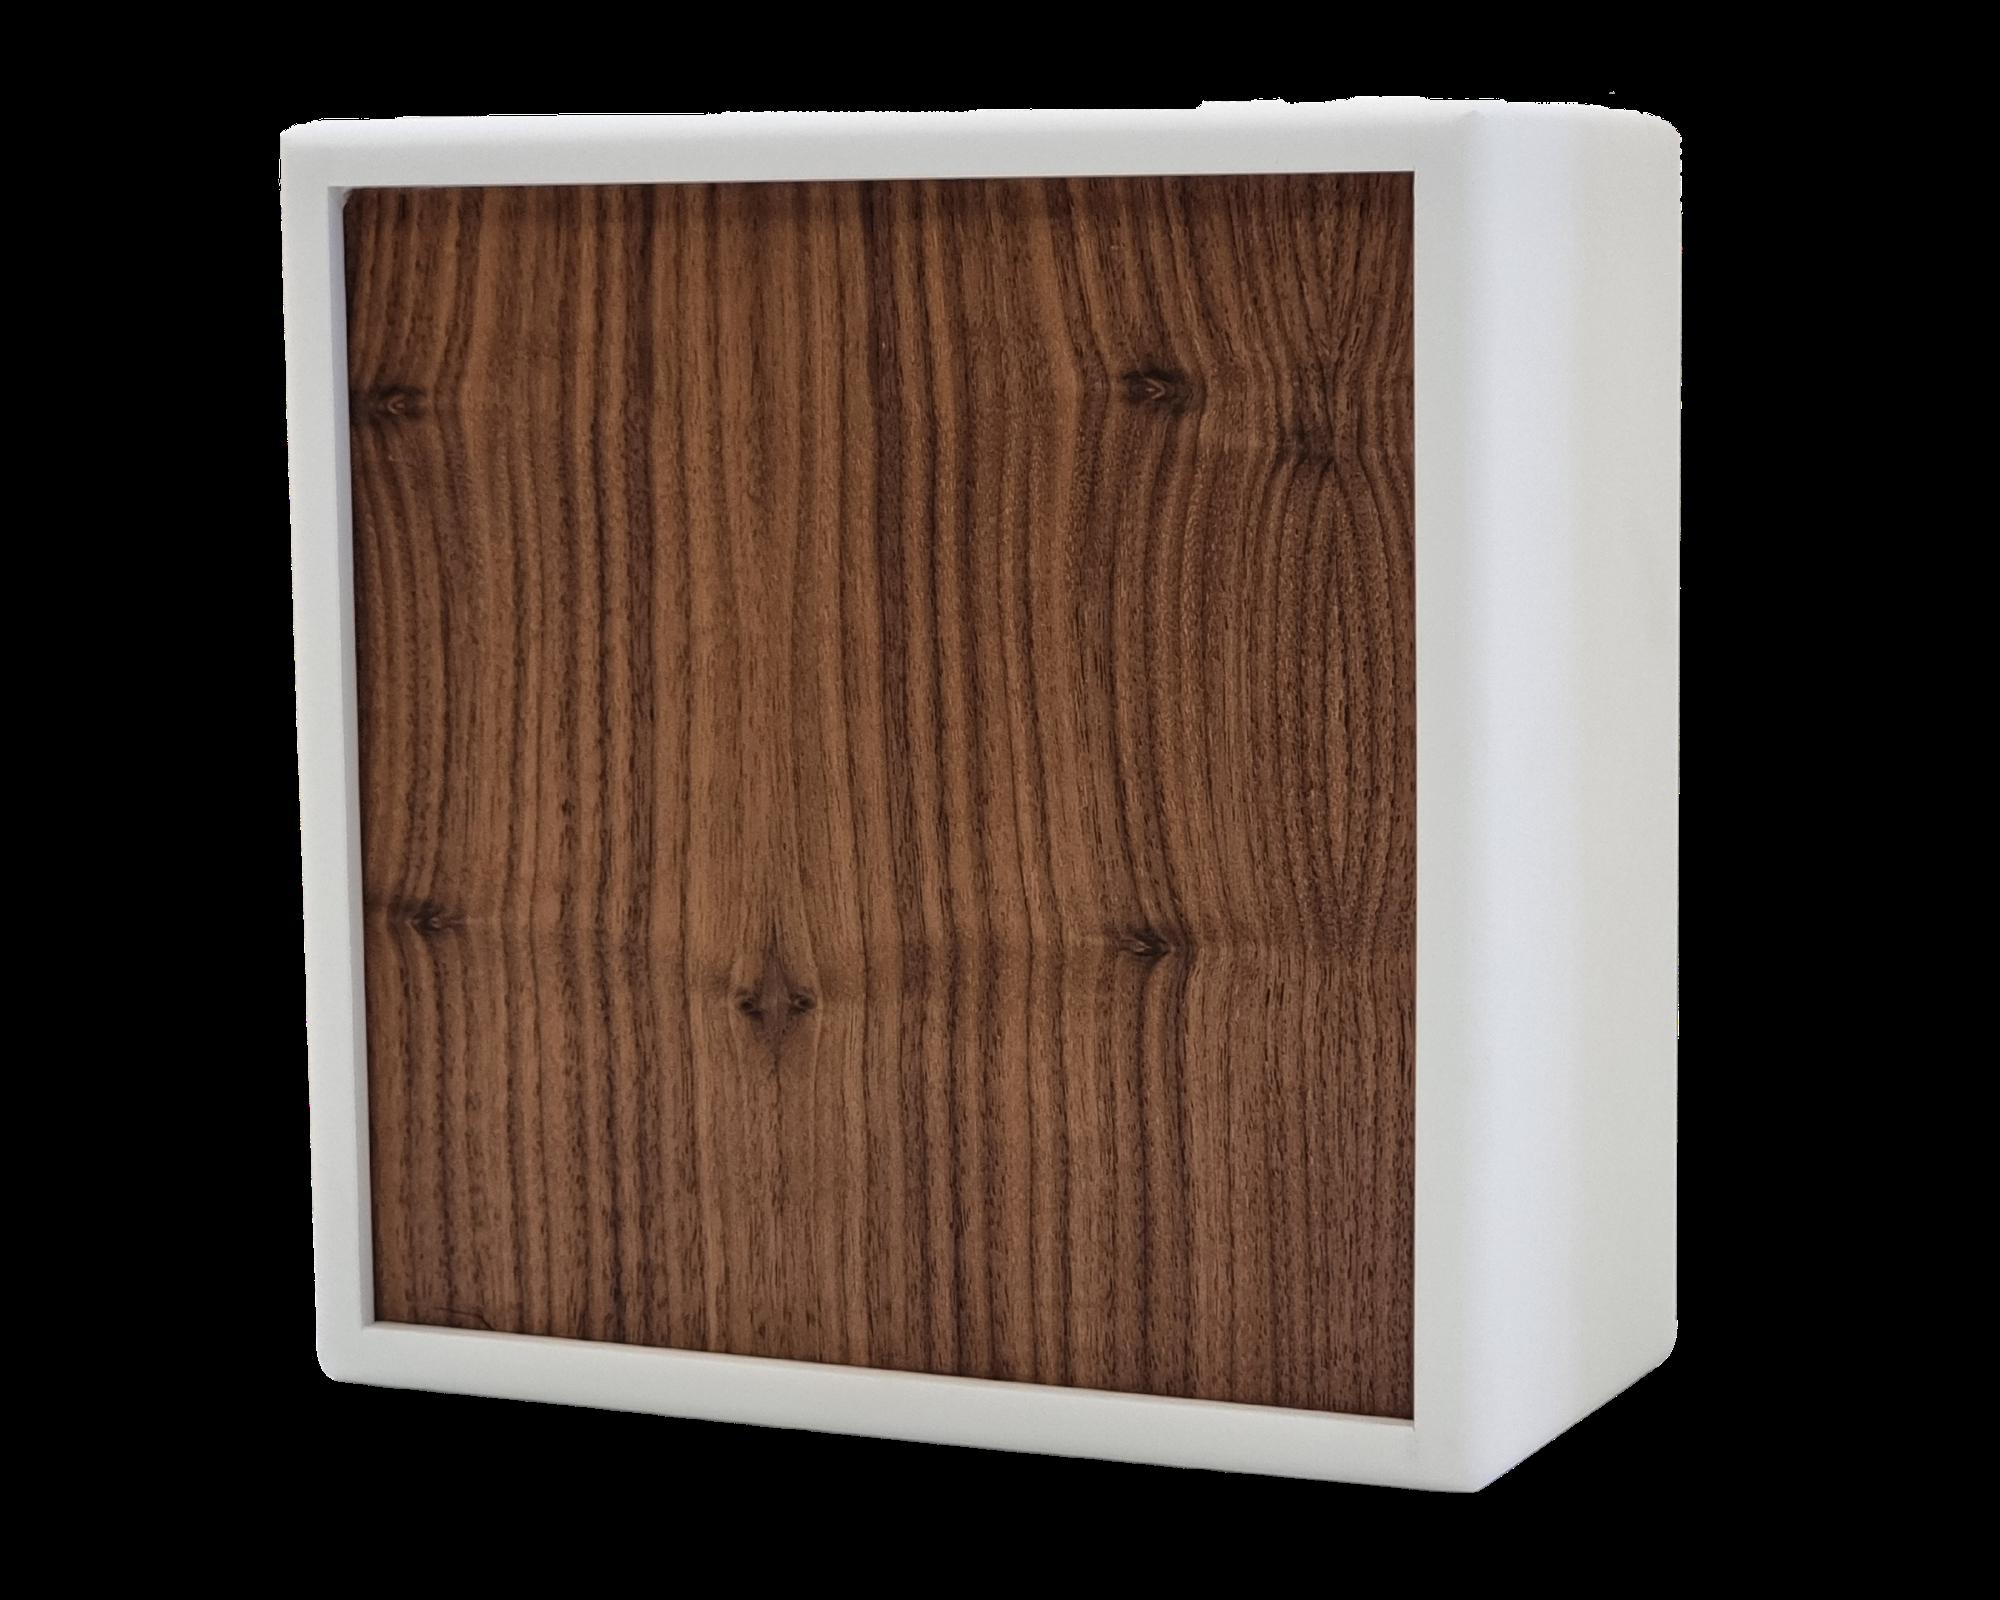 Woosh Scent Box